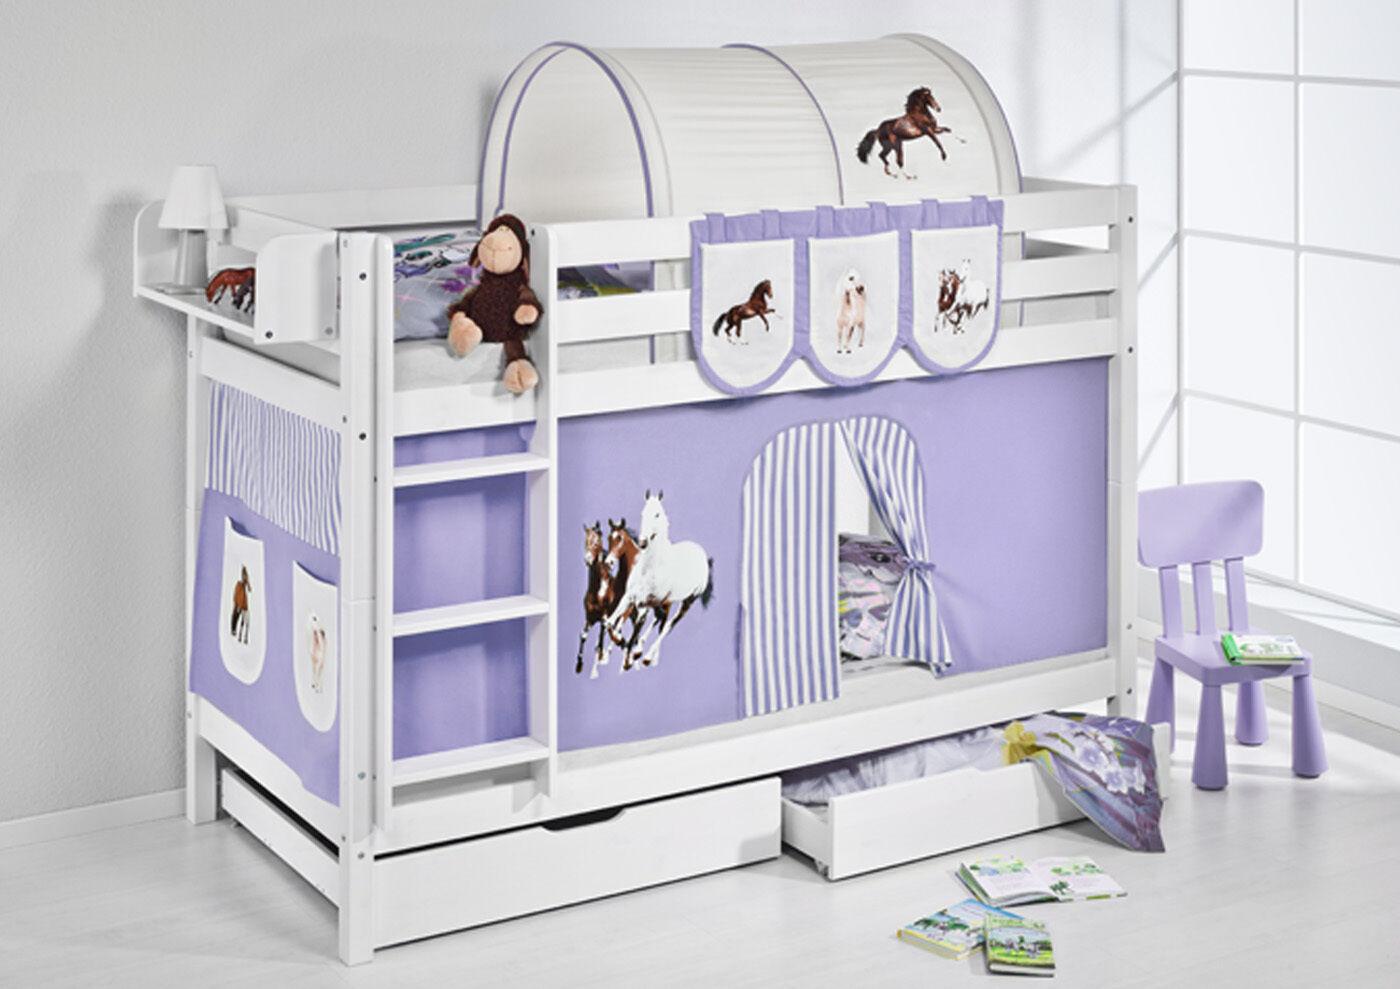 Litera Cama Litera Jelle blanc 190x90 cm + Somier Lilokids Caballos violet